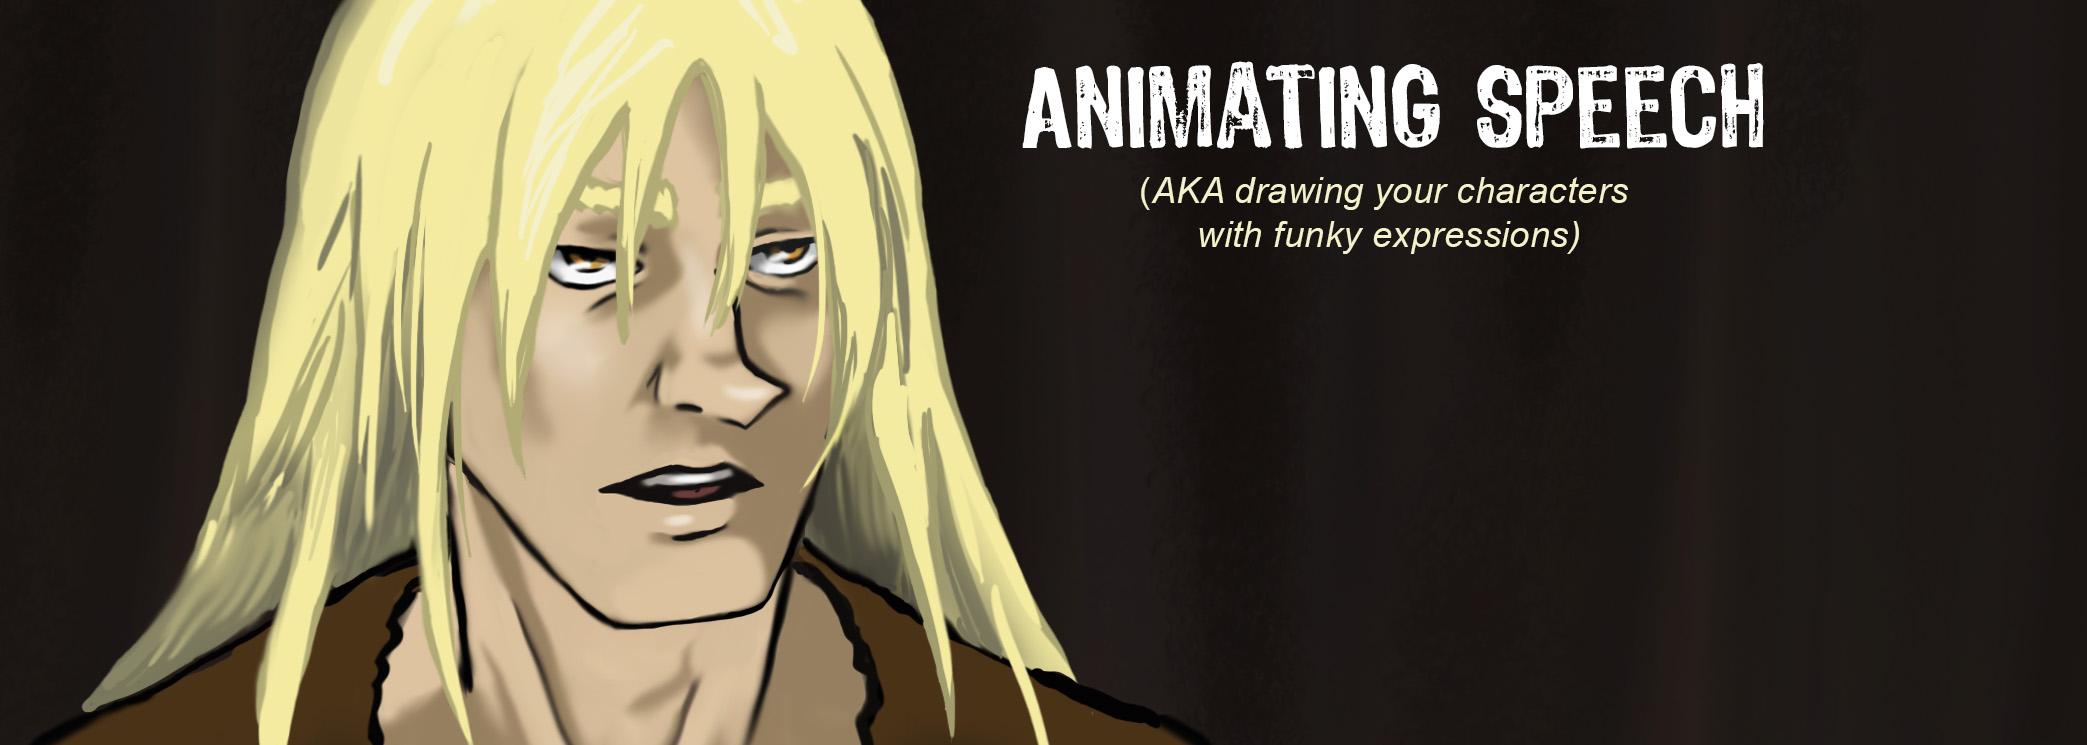 Animating Speech